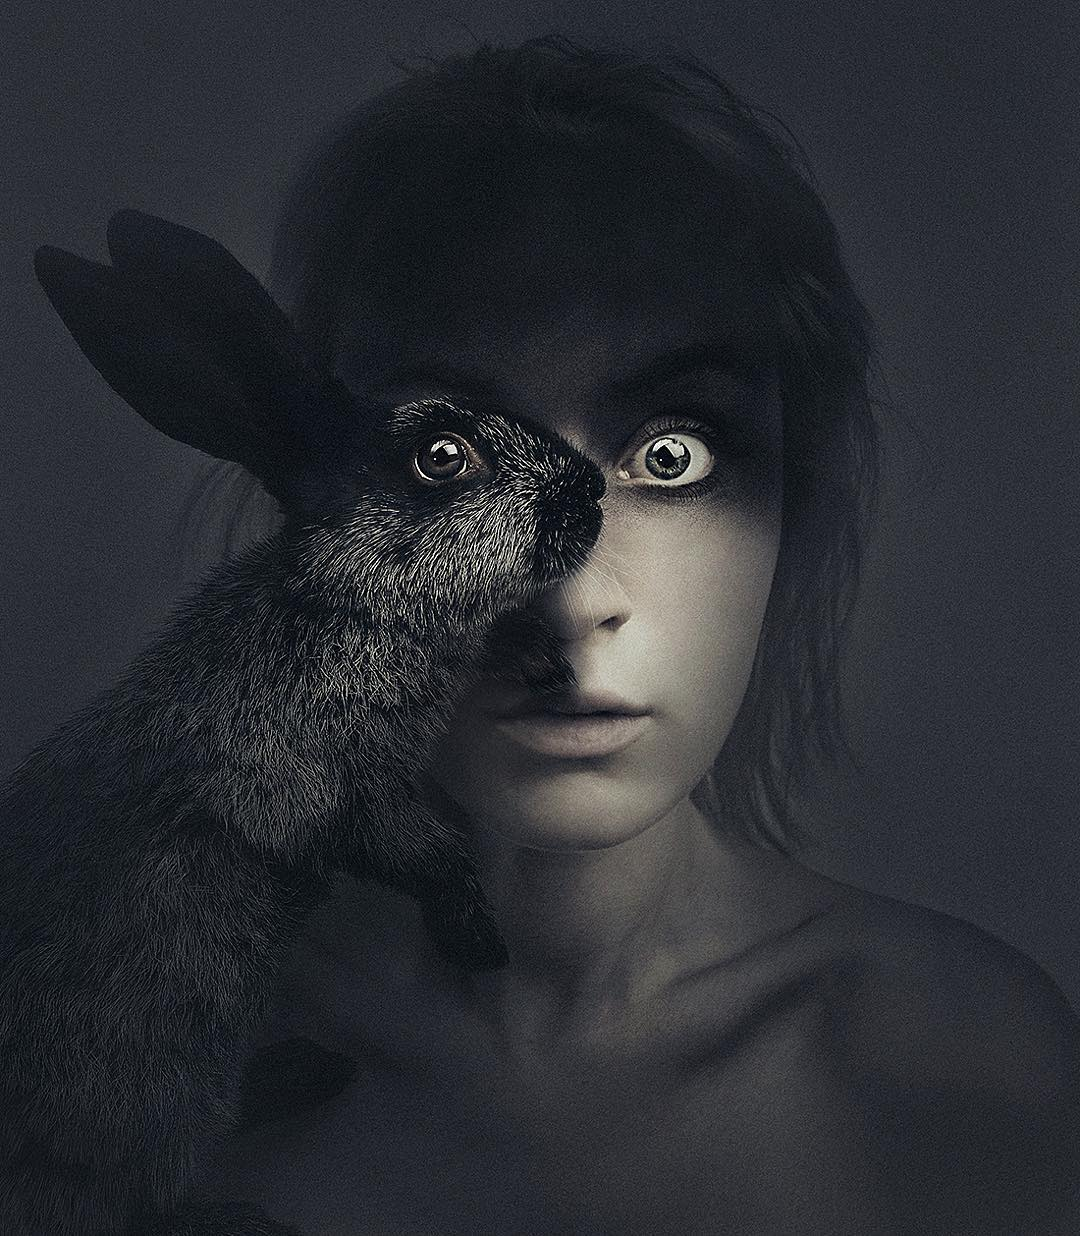 combines_human_and_animal_10